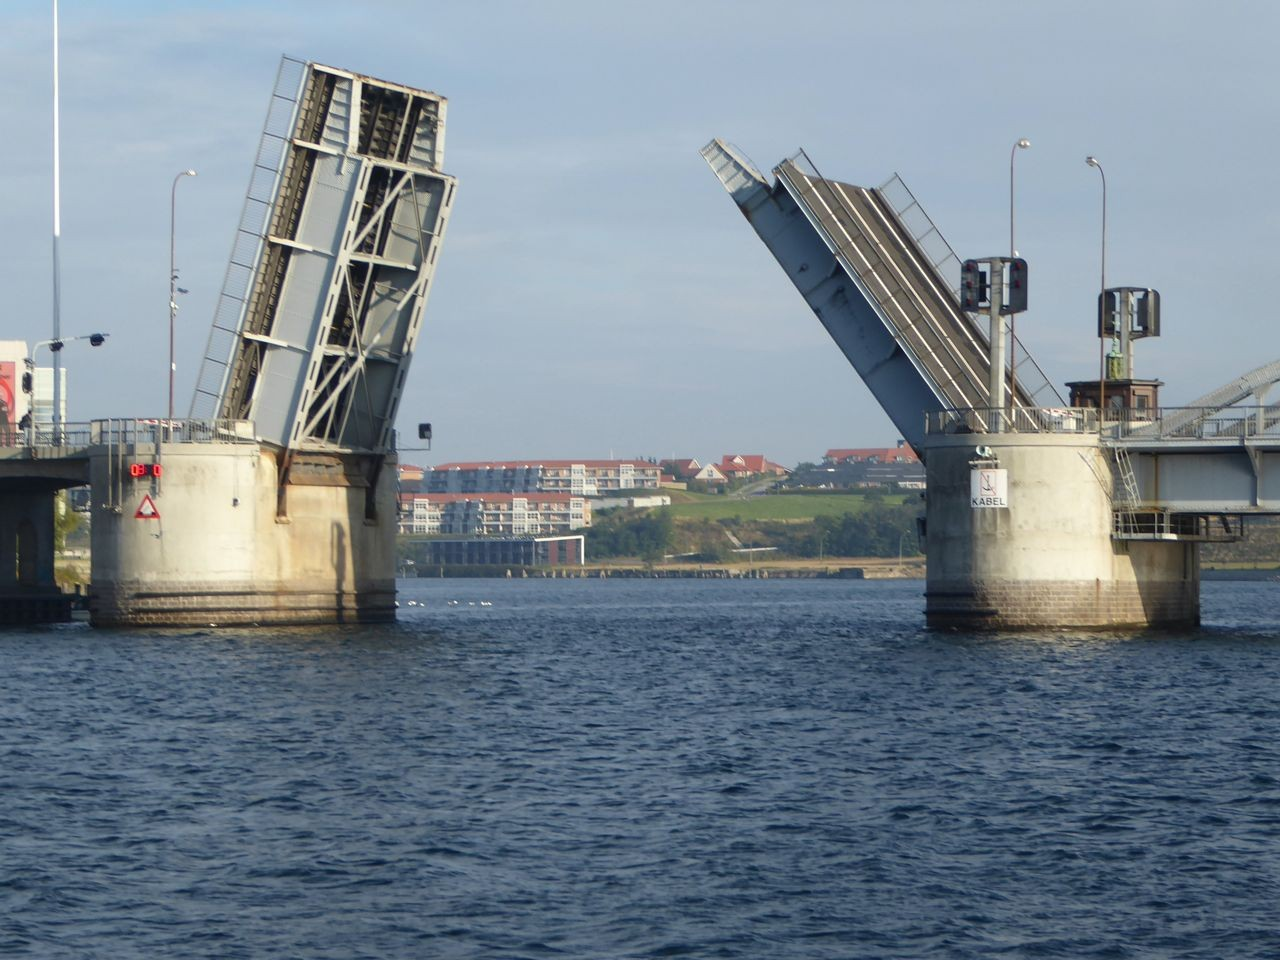 Sonderborg Zugbrücke